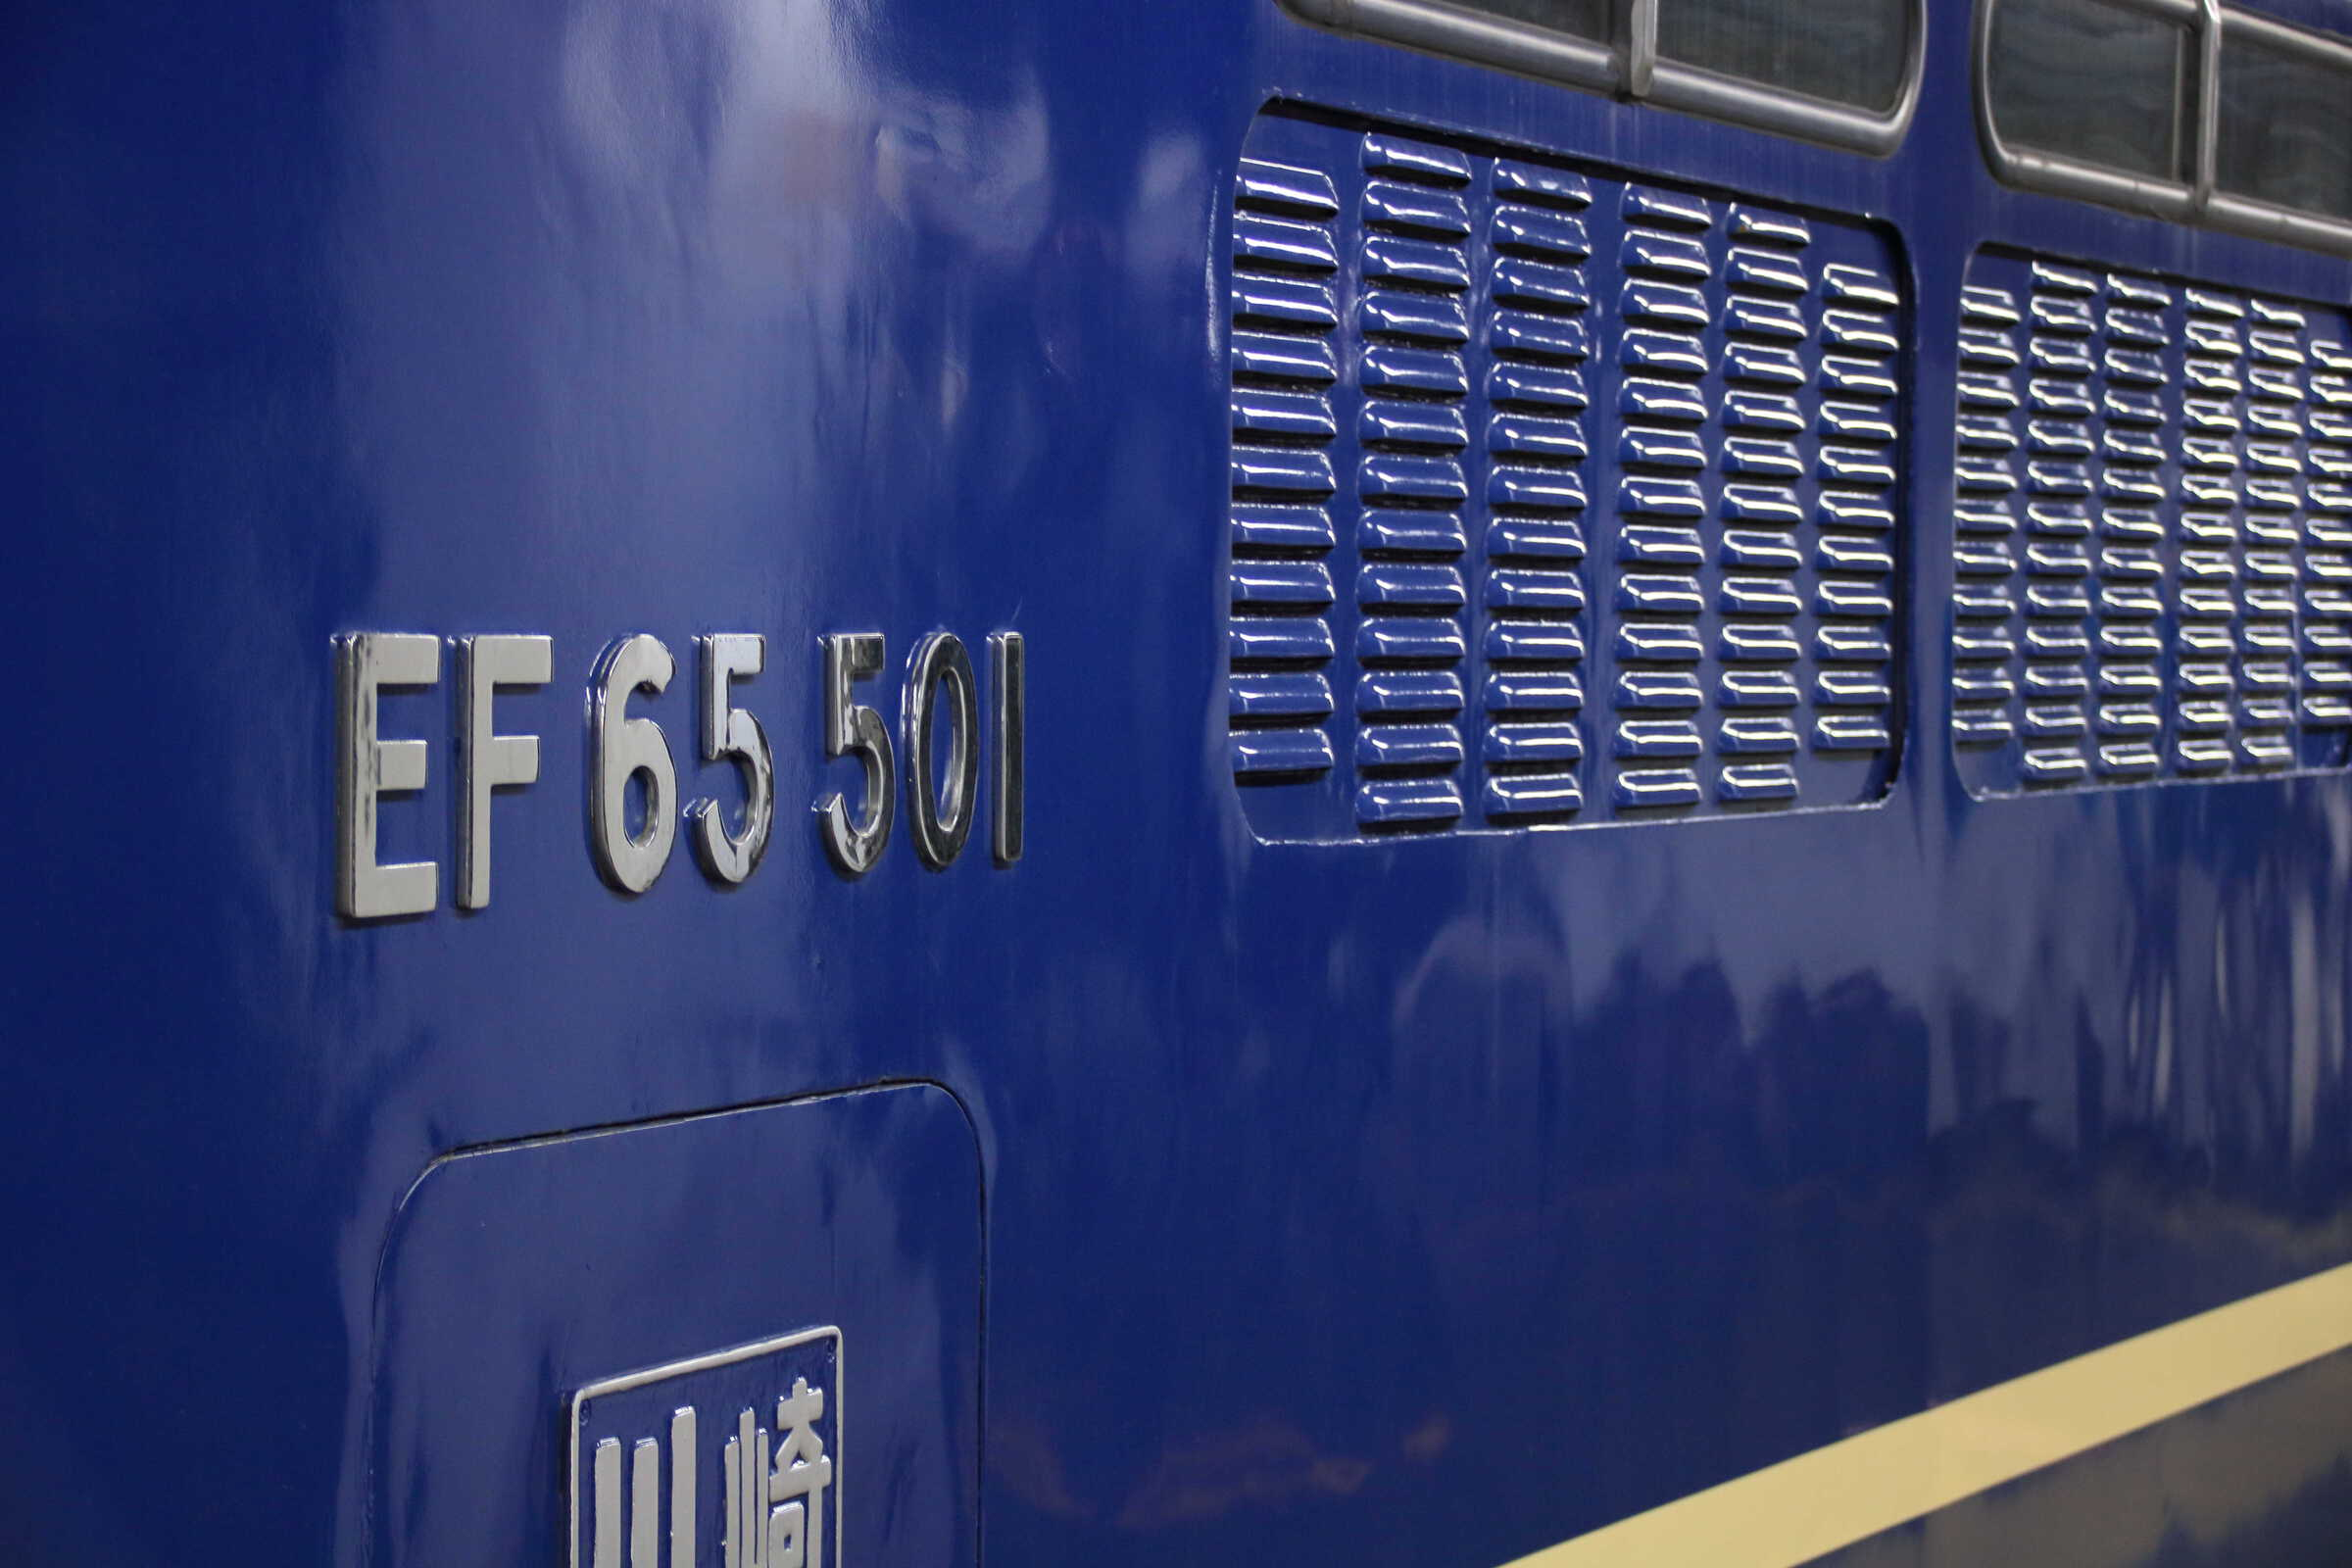 EF65-501[高]